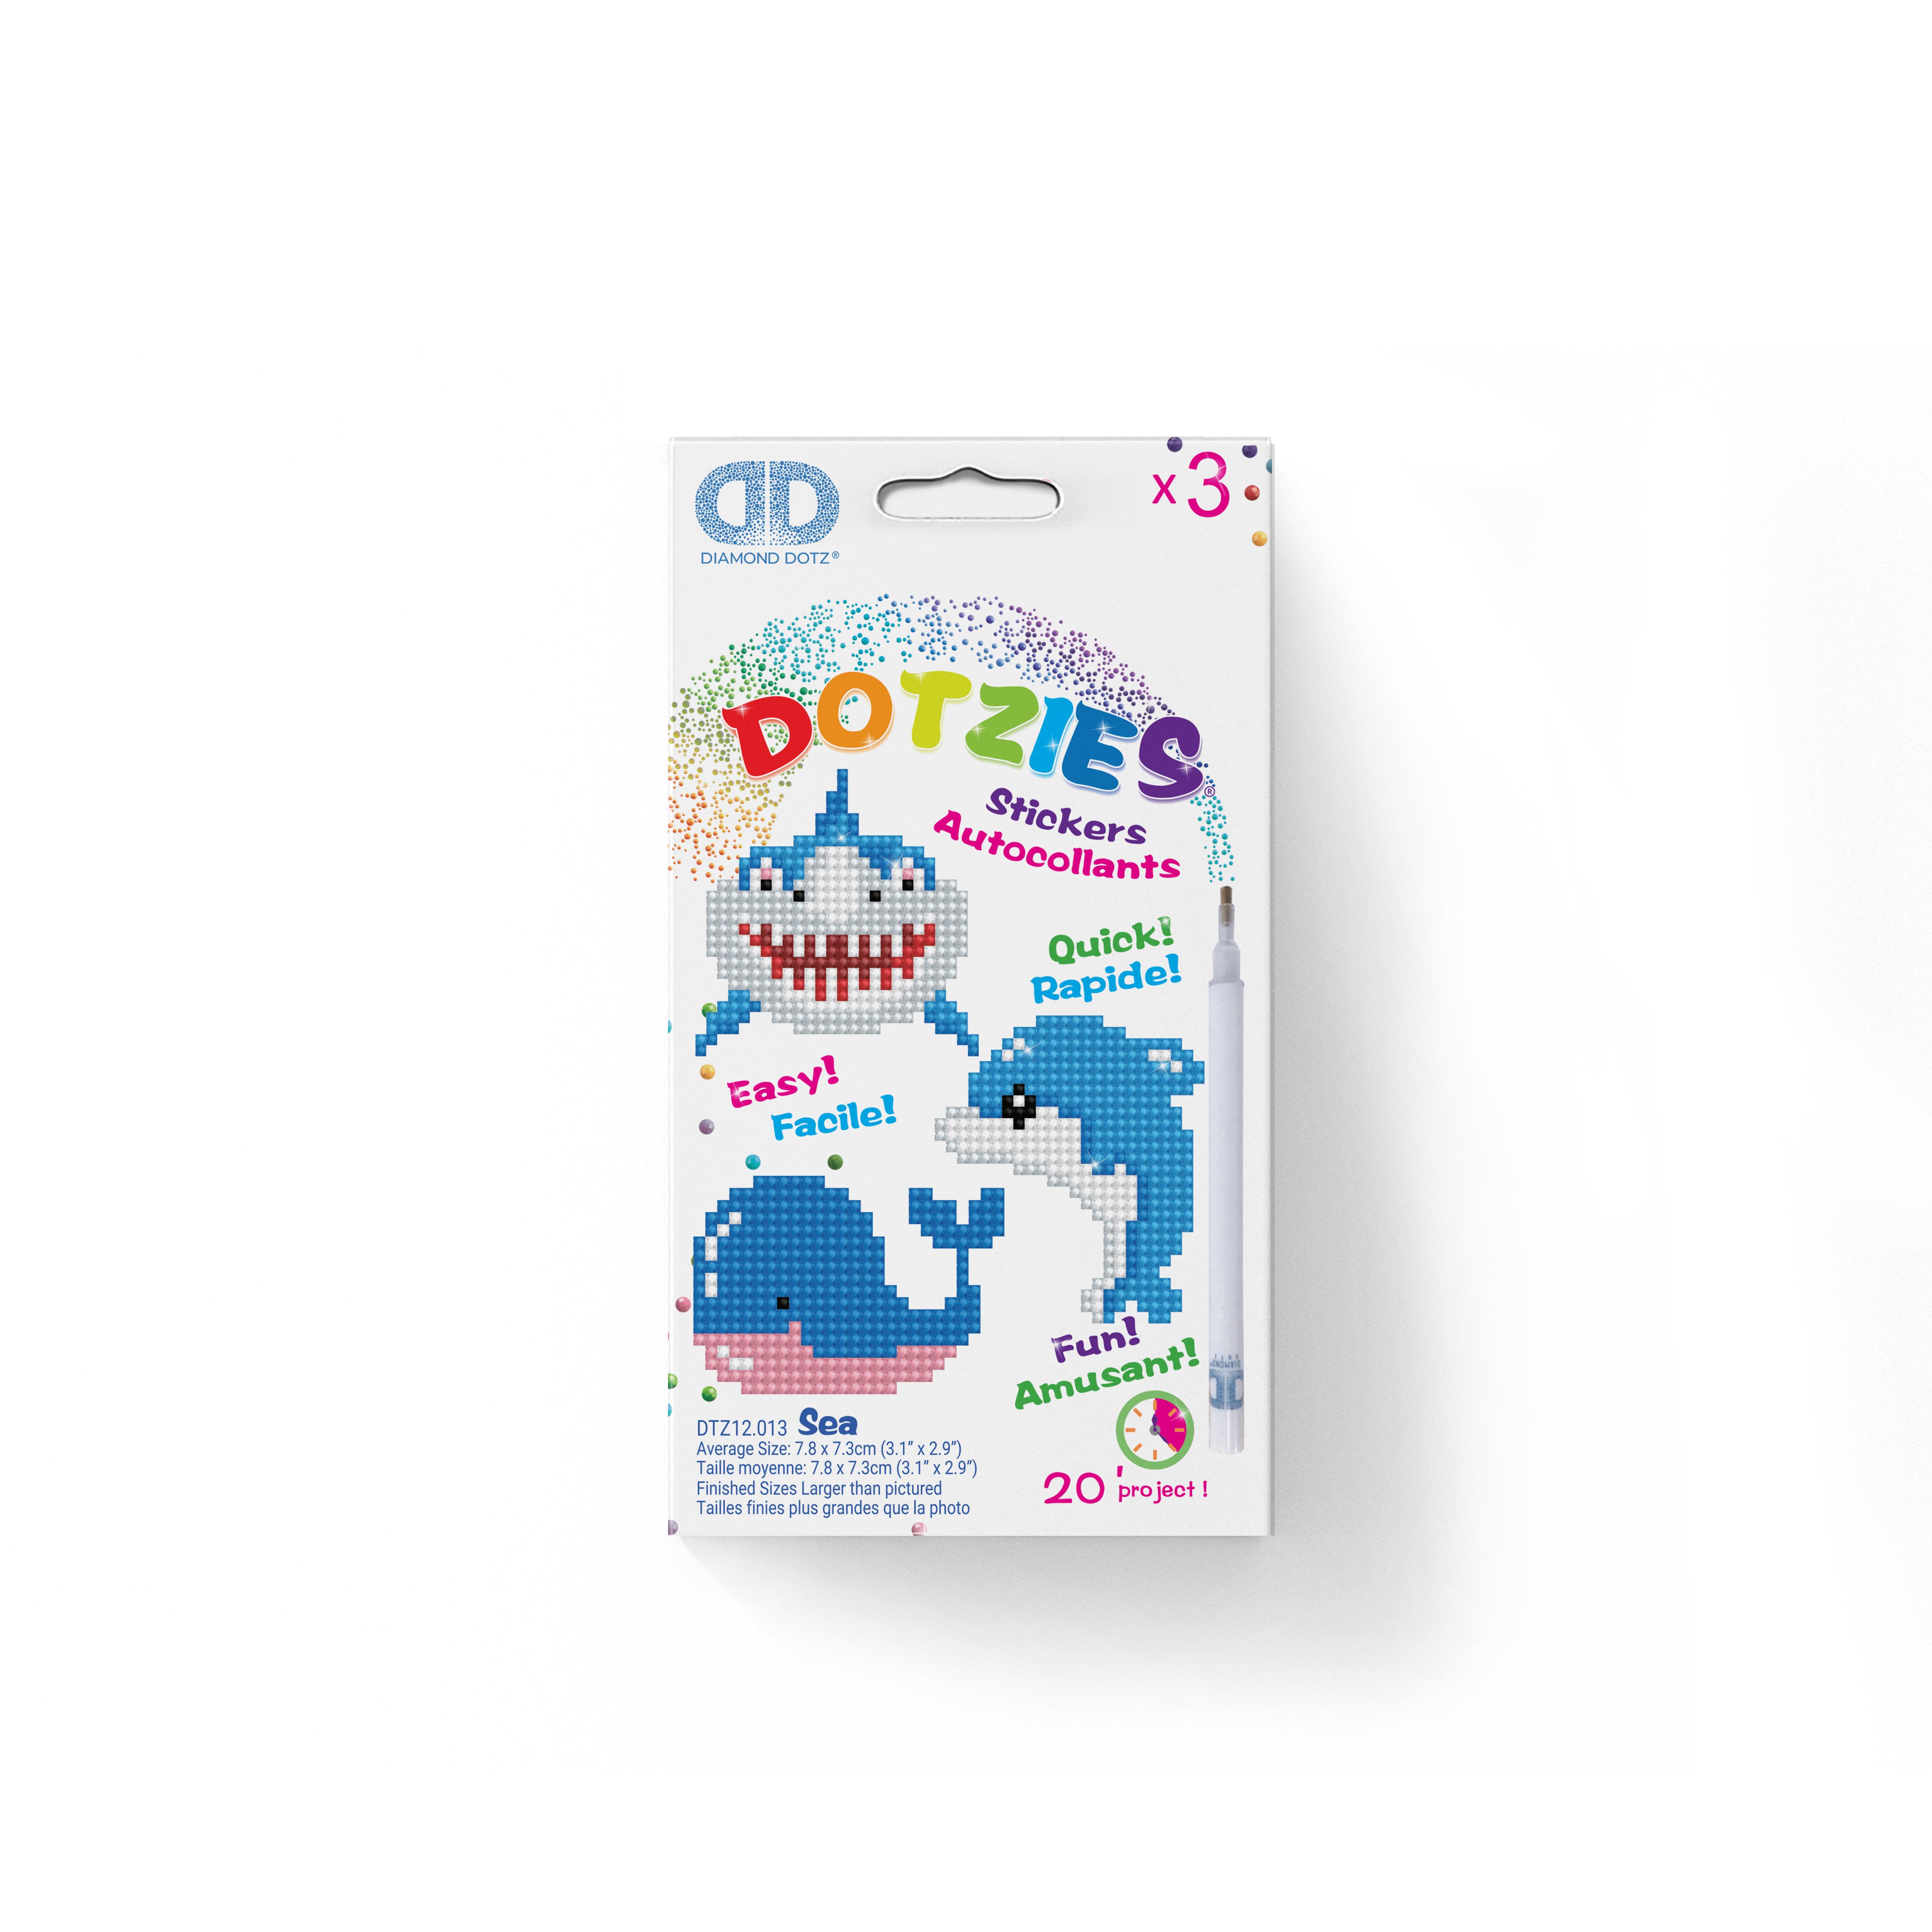 DTZ12.013_packaging